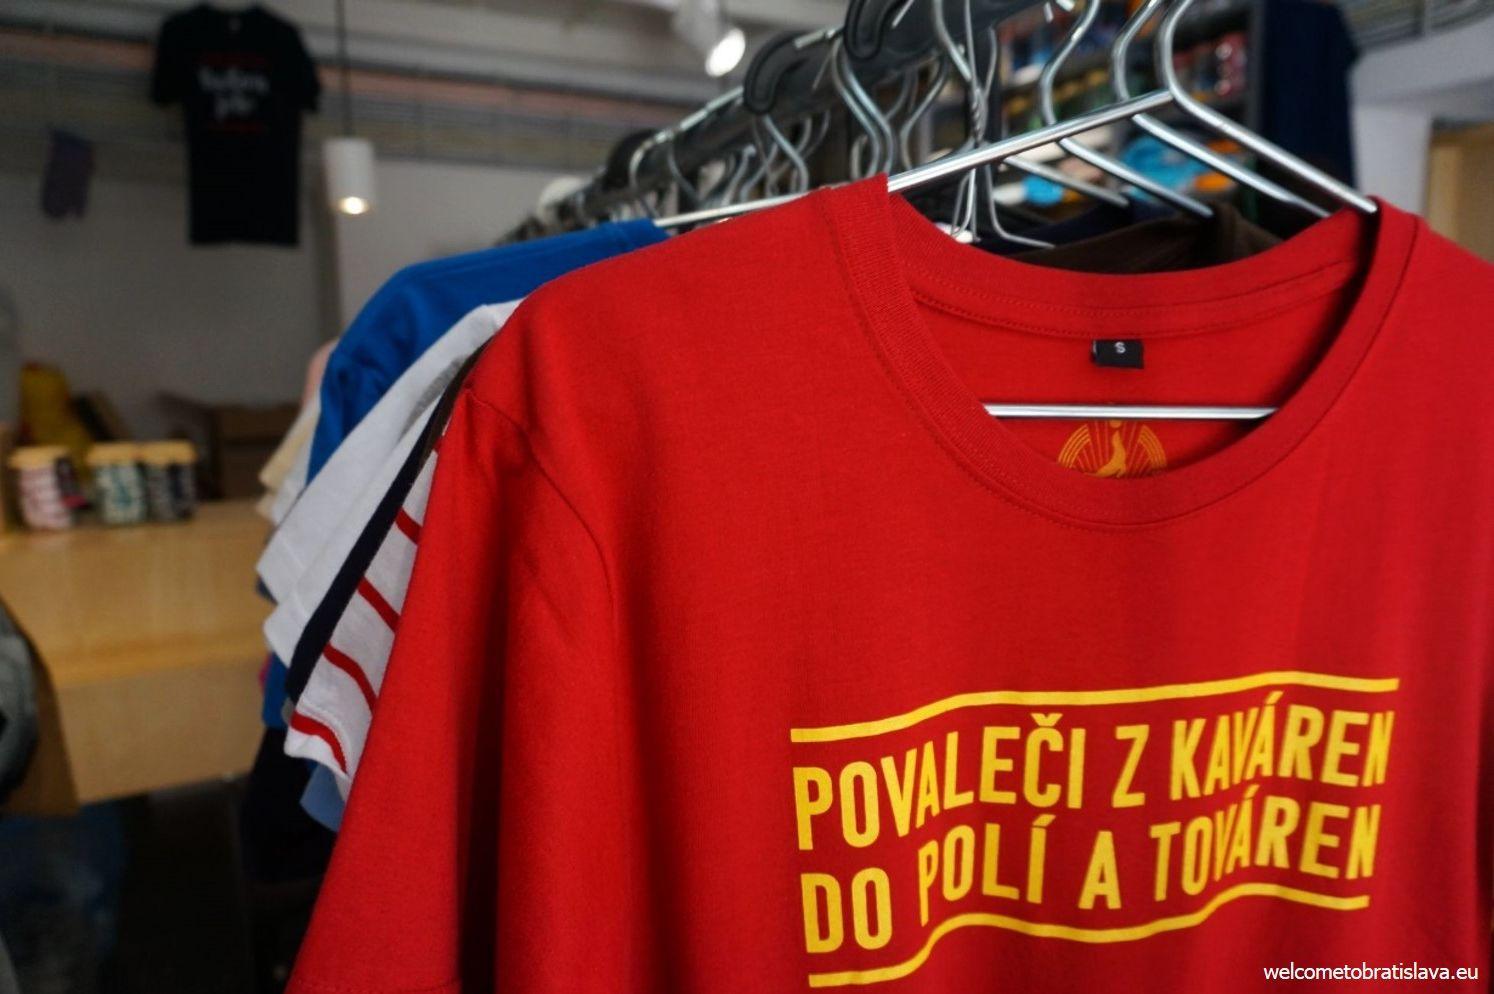 Kompot is full of original T-shirts.